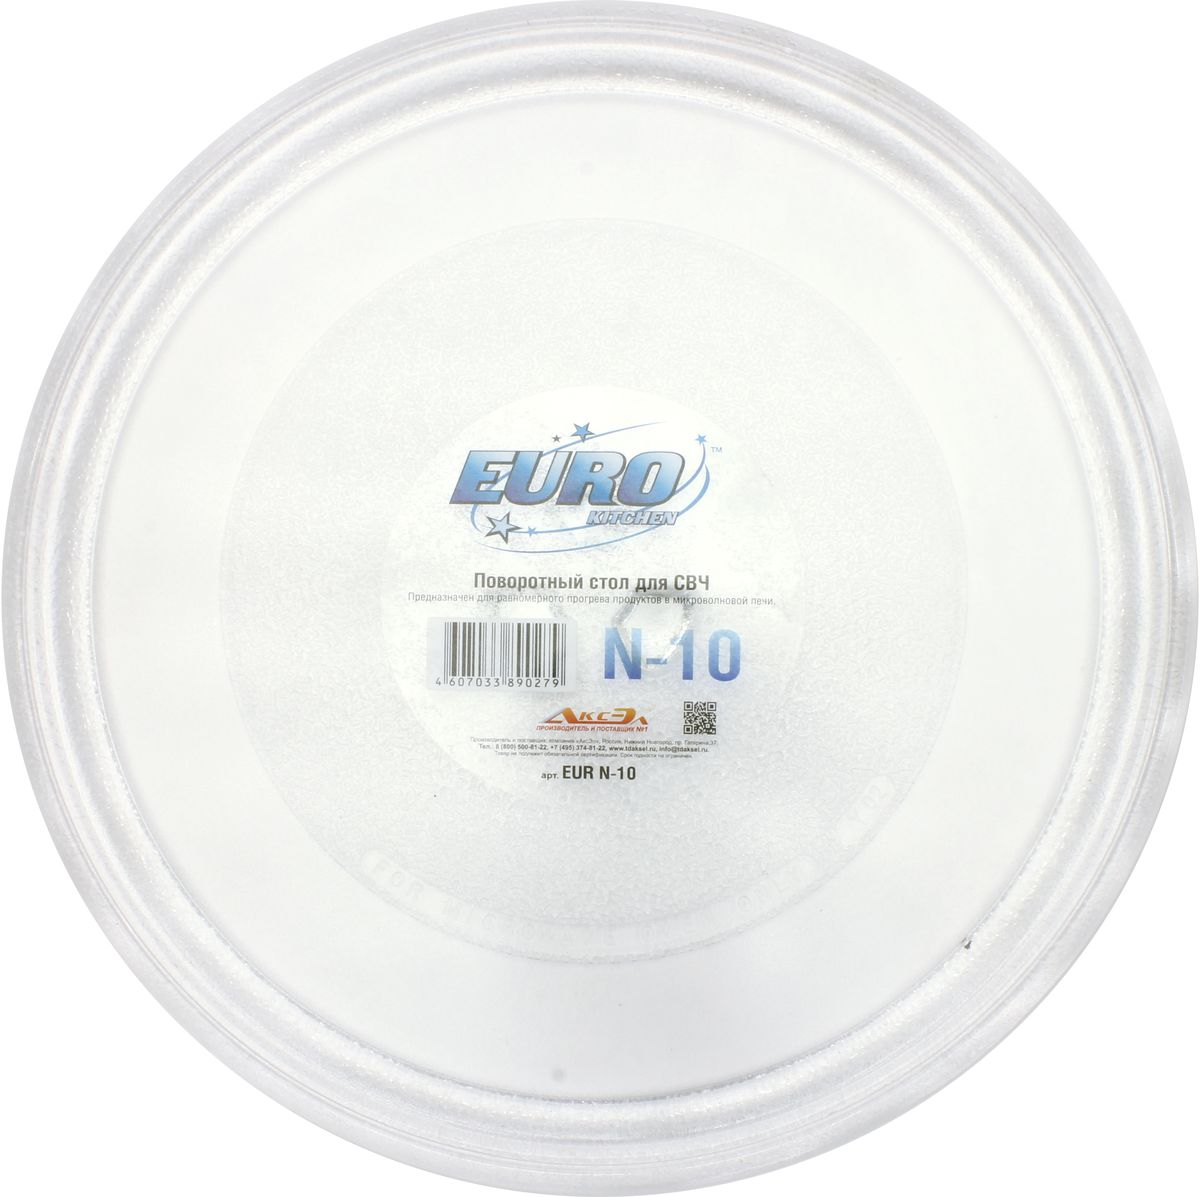 Euro Kitchen N-10 тарелка для СВЧN-10Универсальная тарелка N-10 для микроволновой печи с куплером. Диаметр тарелки 294 мм. Изготовлена из специального жаропрочного стекла. Предназначена для равномерного разогрева продуктов в микроволновой печи.Подходит для брендов:Aeg, Airhot, Amica, Ardo, Ariston, Asko, Atlanta, Aurora, Ava, Barazza, Bauknecht, Bbk, Beko, Bomann, Bork, Bosch, Brandt, Candy, Cata, Centek, Clatronic, Daewoo, De dietrich, Delfa, Electrolux, Elenberg, Ergo, Erisson, Eurotec, Fagor, Fimar, Foster, Franke, Fulgor, Fusion, Gaggenau, Gastrorag, Goldstar, Gorenje, Hankel, Hansa, Hilton, Horizont, Hurakan, Hyundai, Ilve, Indesit, Kaiser, Kenmore, Kenwood, Korting, Kuppersberg, Kuppersbusch, Kamark, Keran, Lg, Liberton, Liberty, Maxwell, Menumaster, Midea, Miele, Moulinex, Mystery, Neff, Oursson, Panasonic, Proficook, Rainford, Redmond, Rolsen, Samsung, Saturn, Scarlett, Sencor, Sharp, Siemens, Simfer, Sinbo, Sirman, Smeg, Supra, Teka, Thomson, Toshiba, V-zug, Vasko, Vimar, Vitek, Vr, Weissgauff, West, Whirlpool, Zanussi, Zelmer, Zigmund&Shtain, Витязь, Рубин.